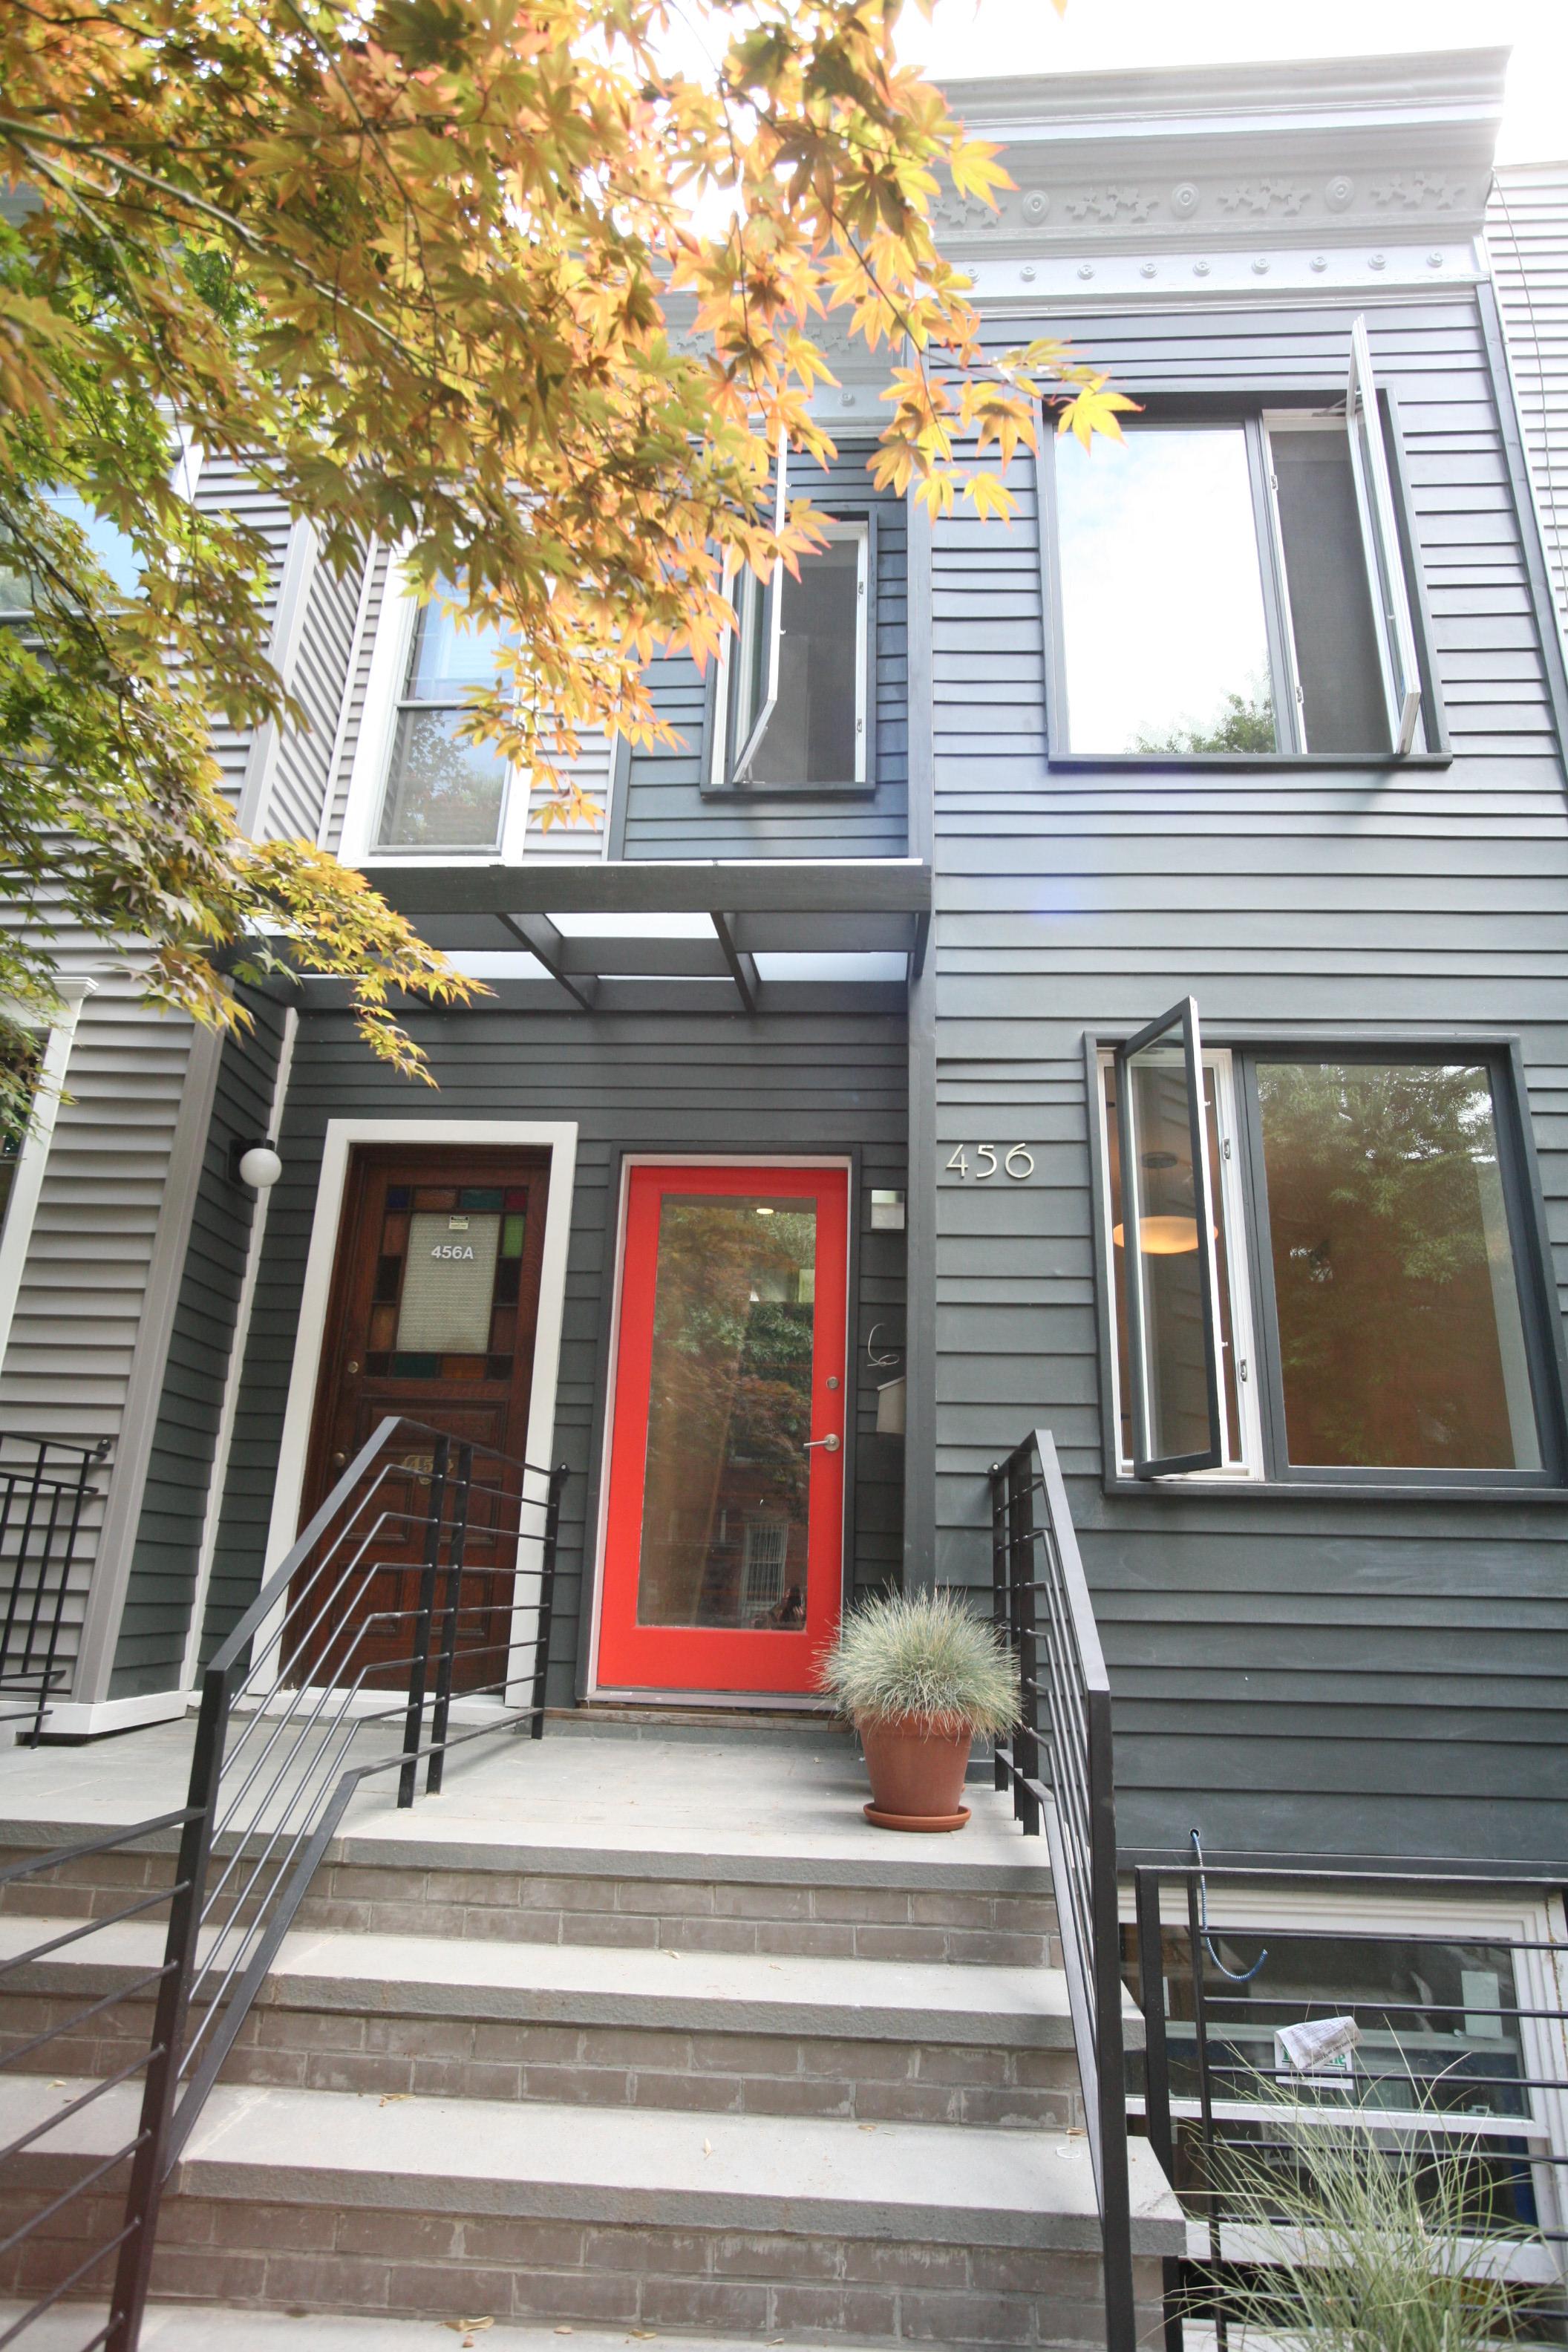 456 17th Street, Apt HSE, Brooklyn, New York 11215